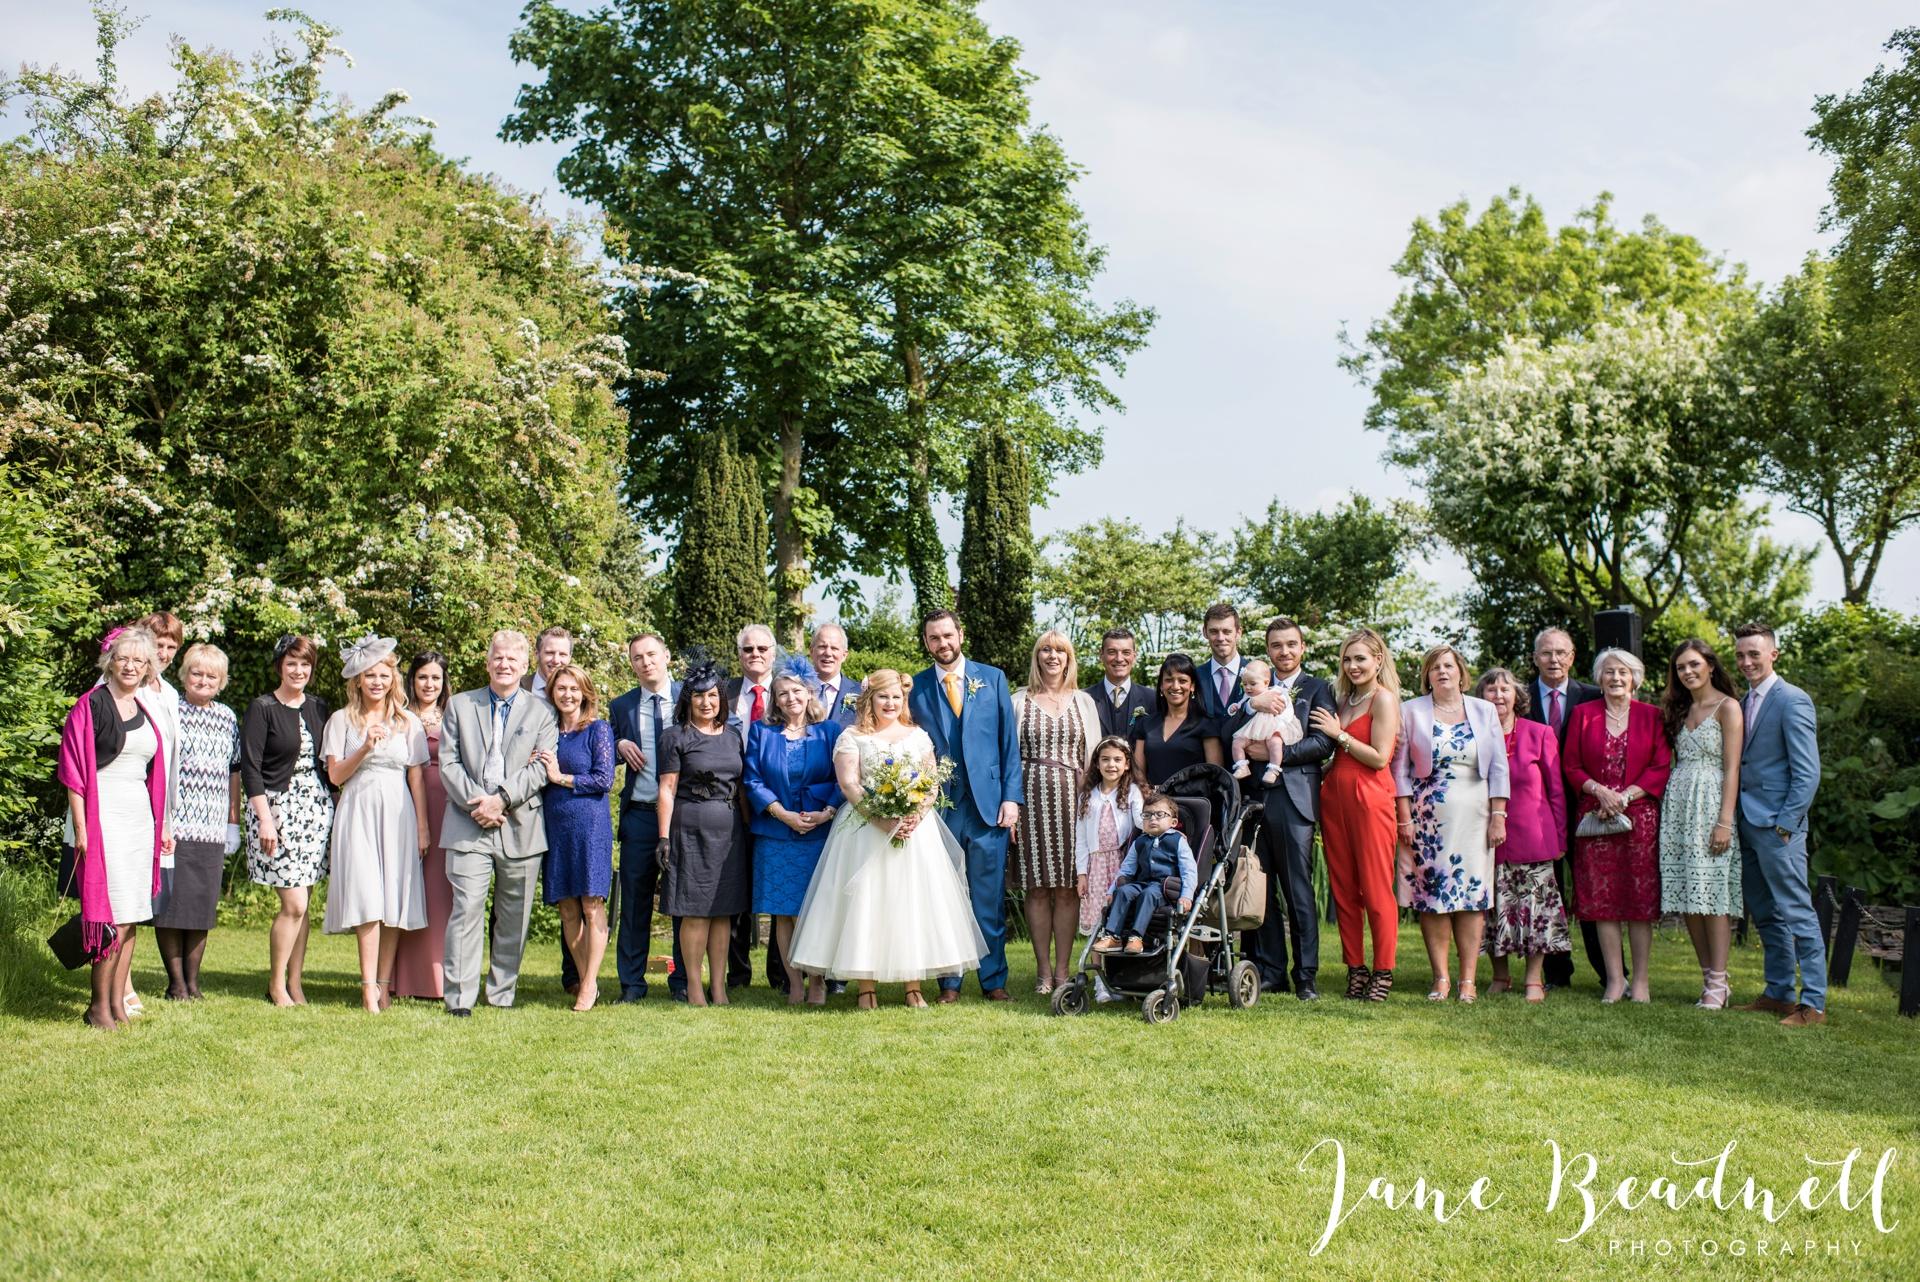 South Farm Wedding photography Hertfordshire by Jane Beadnell Photography fine art wedding photographer_0097